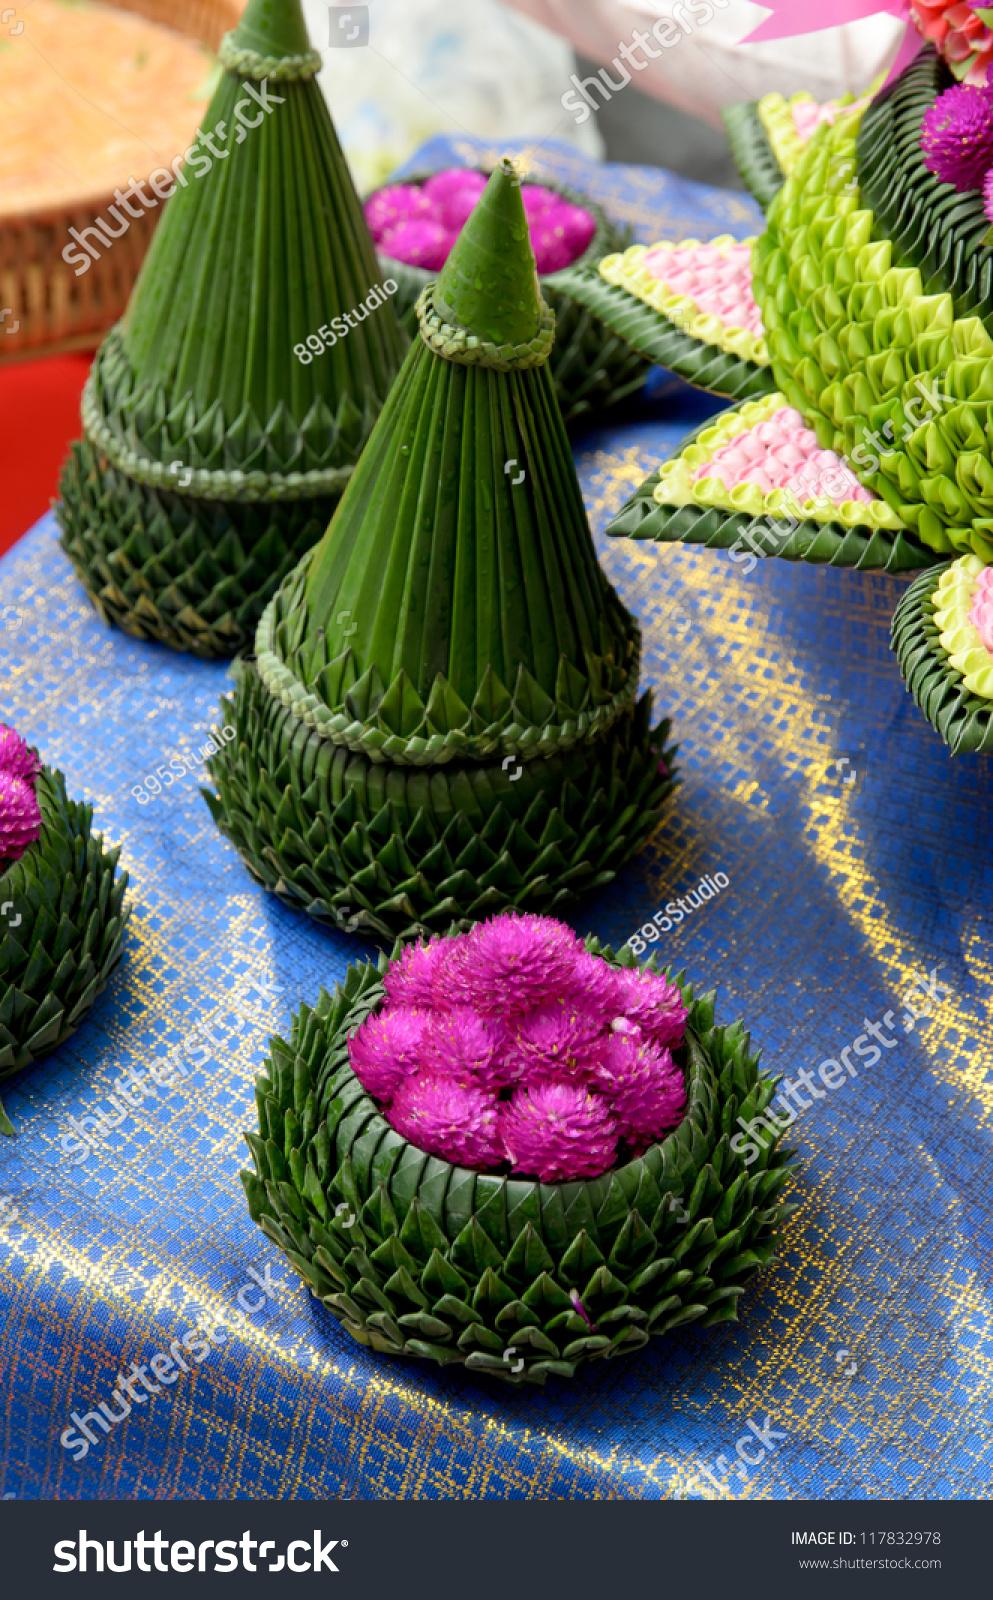 flower in banana leaf art handwork thai style stock photo. Black Bedroom Furniture Sets. Home Design Ideas